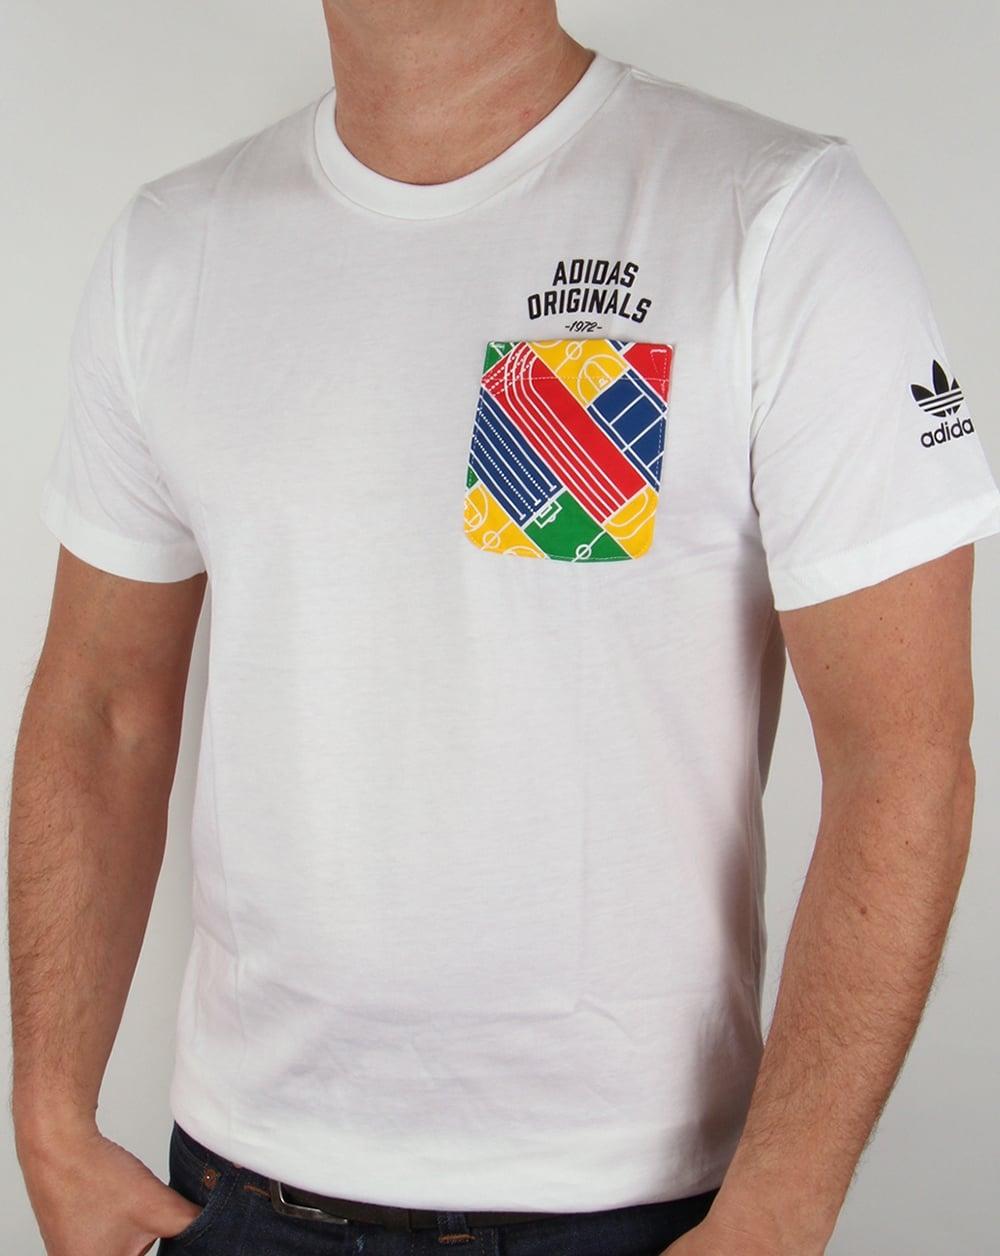 Buy adidas classic t shirt white for Adidas classic t shirt